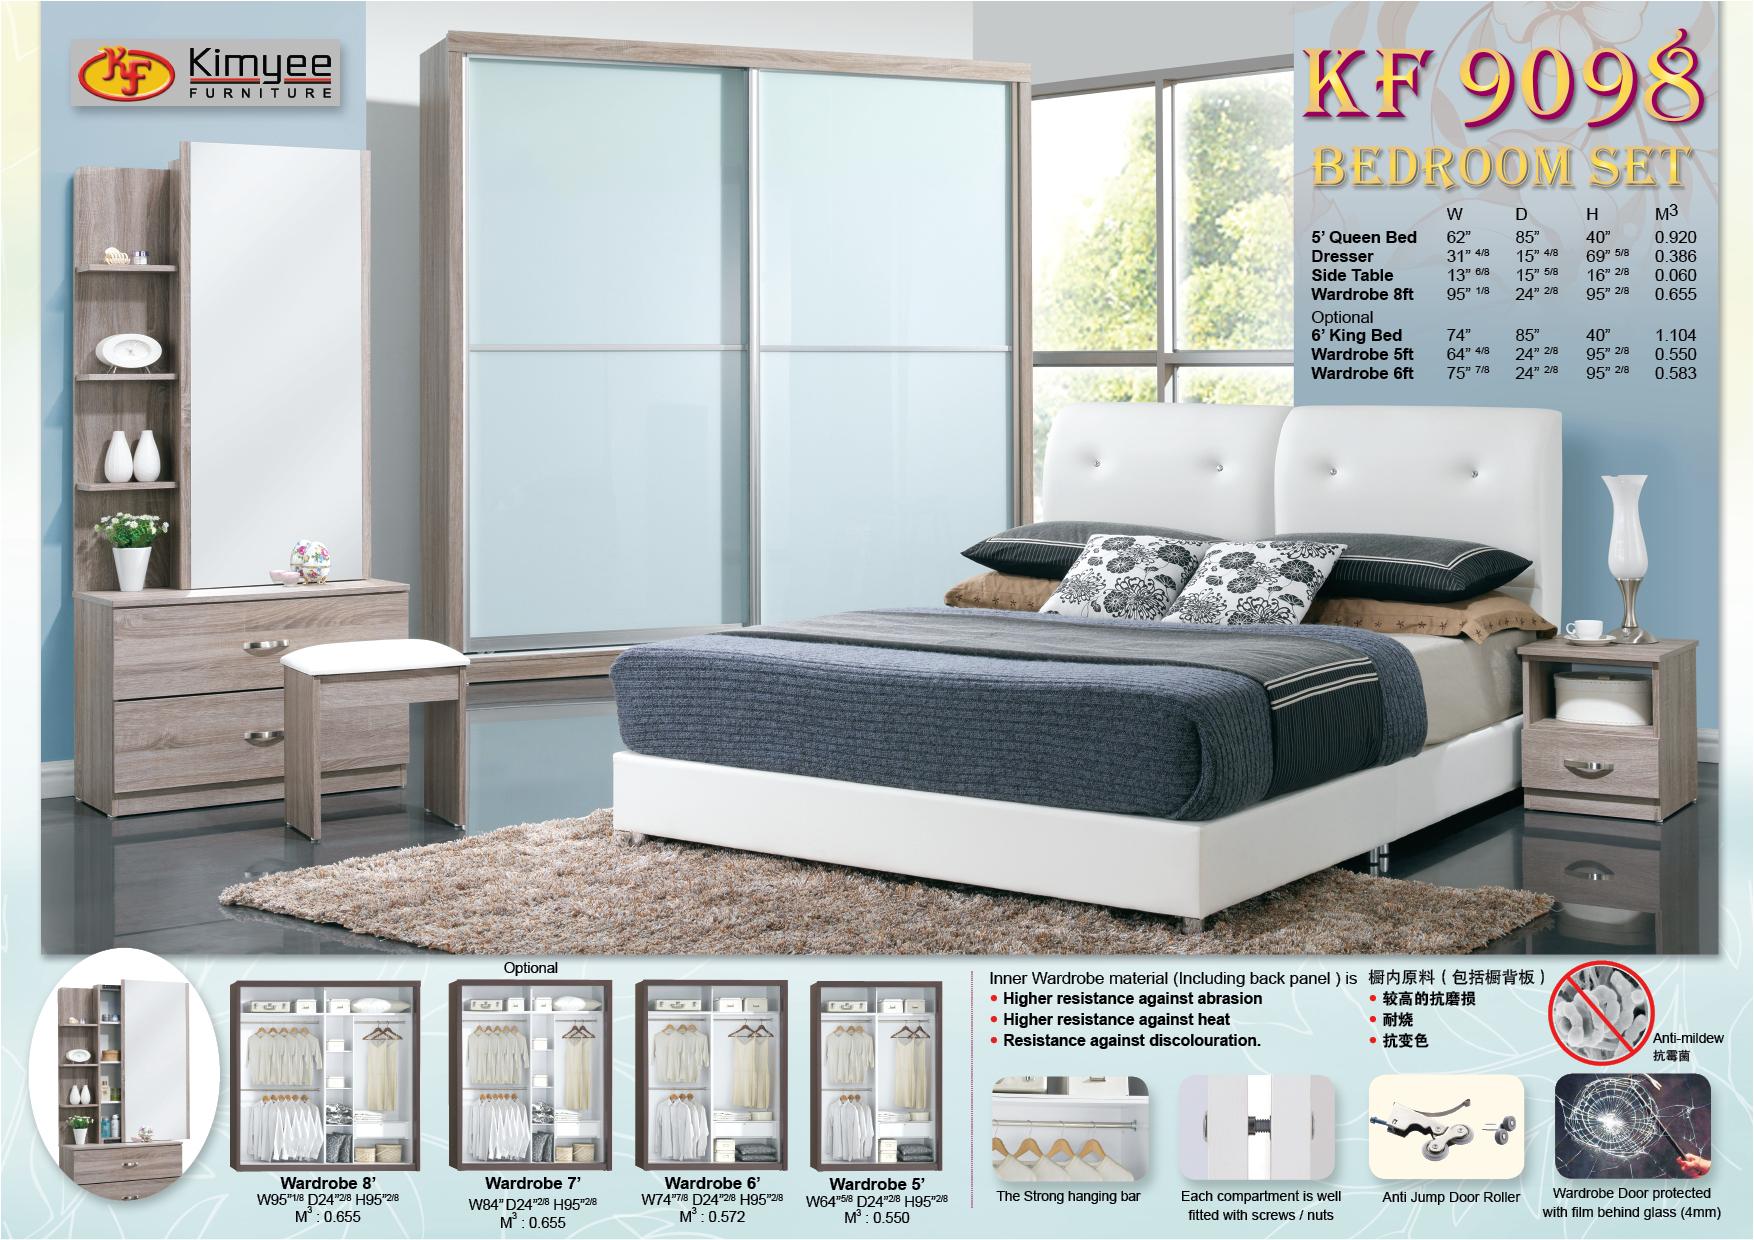 KF9098